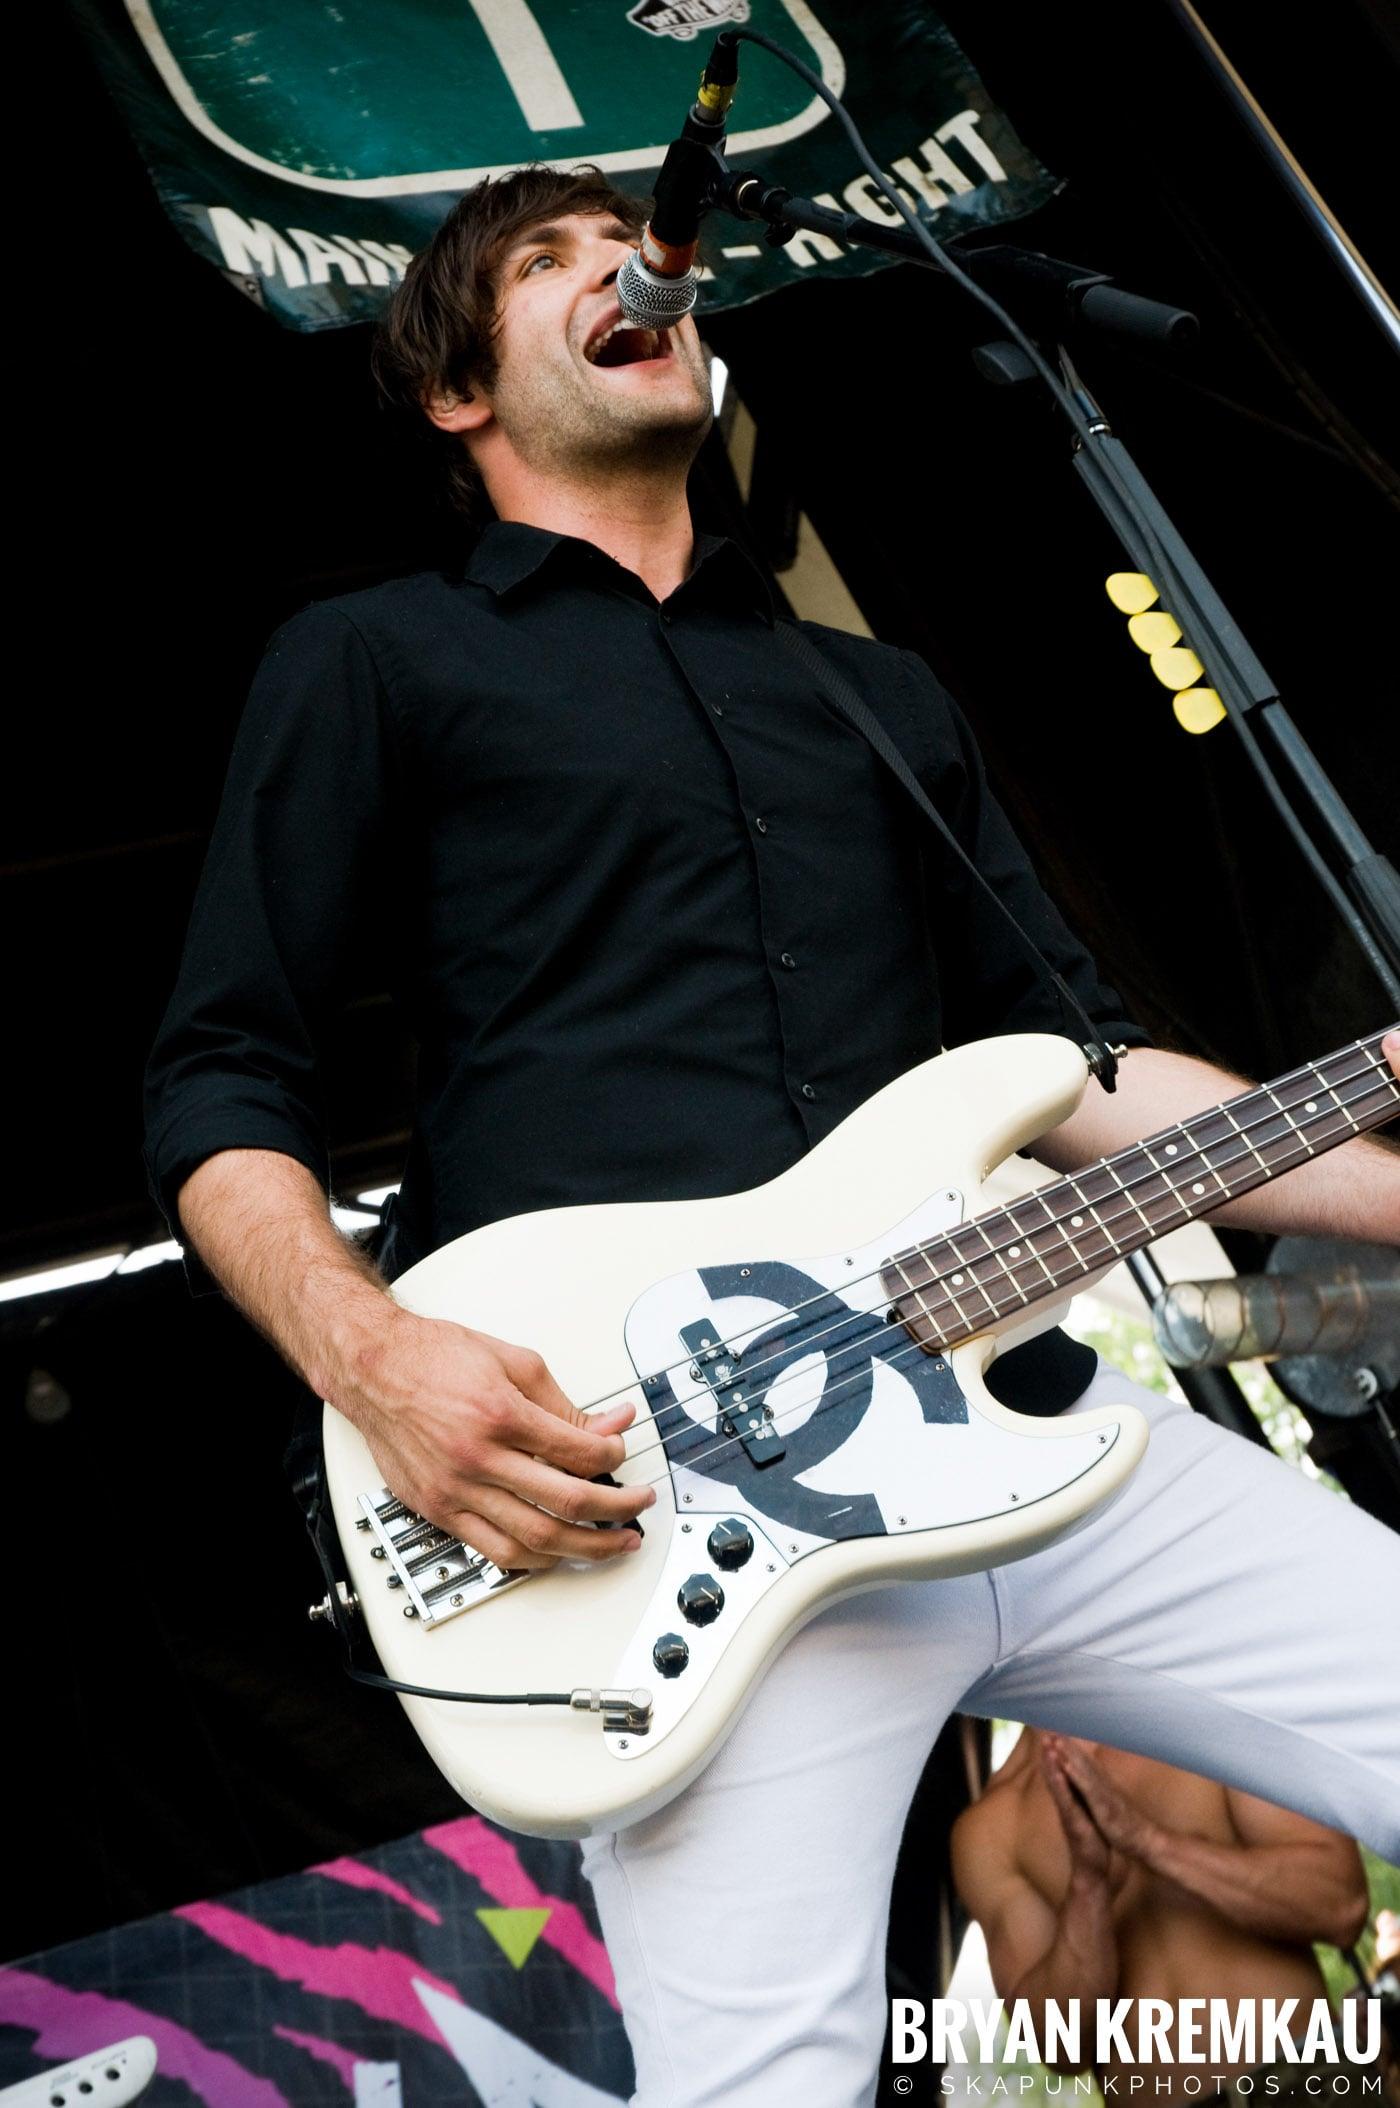 Cobra Starship @ Warped Tour 08, Scranton PA - 7.27.08 (2)